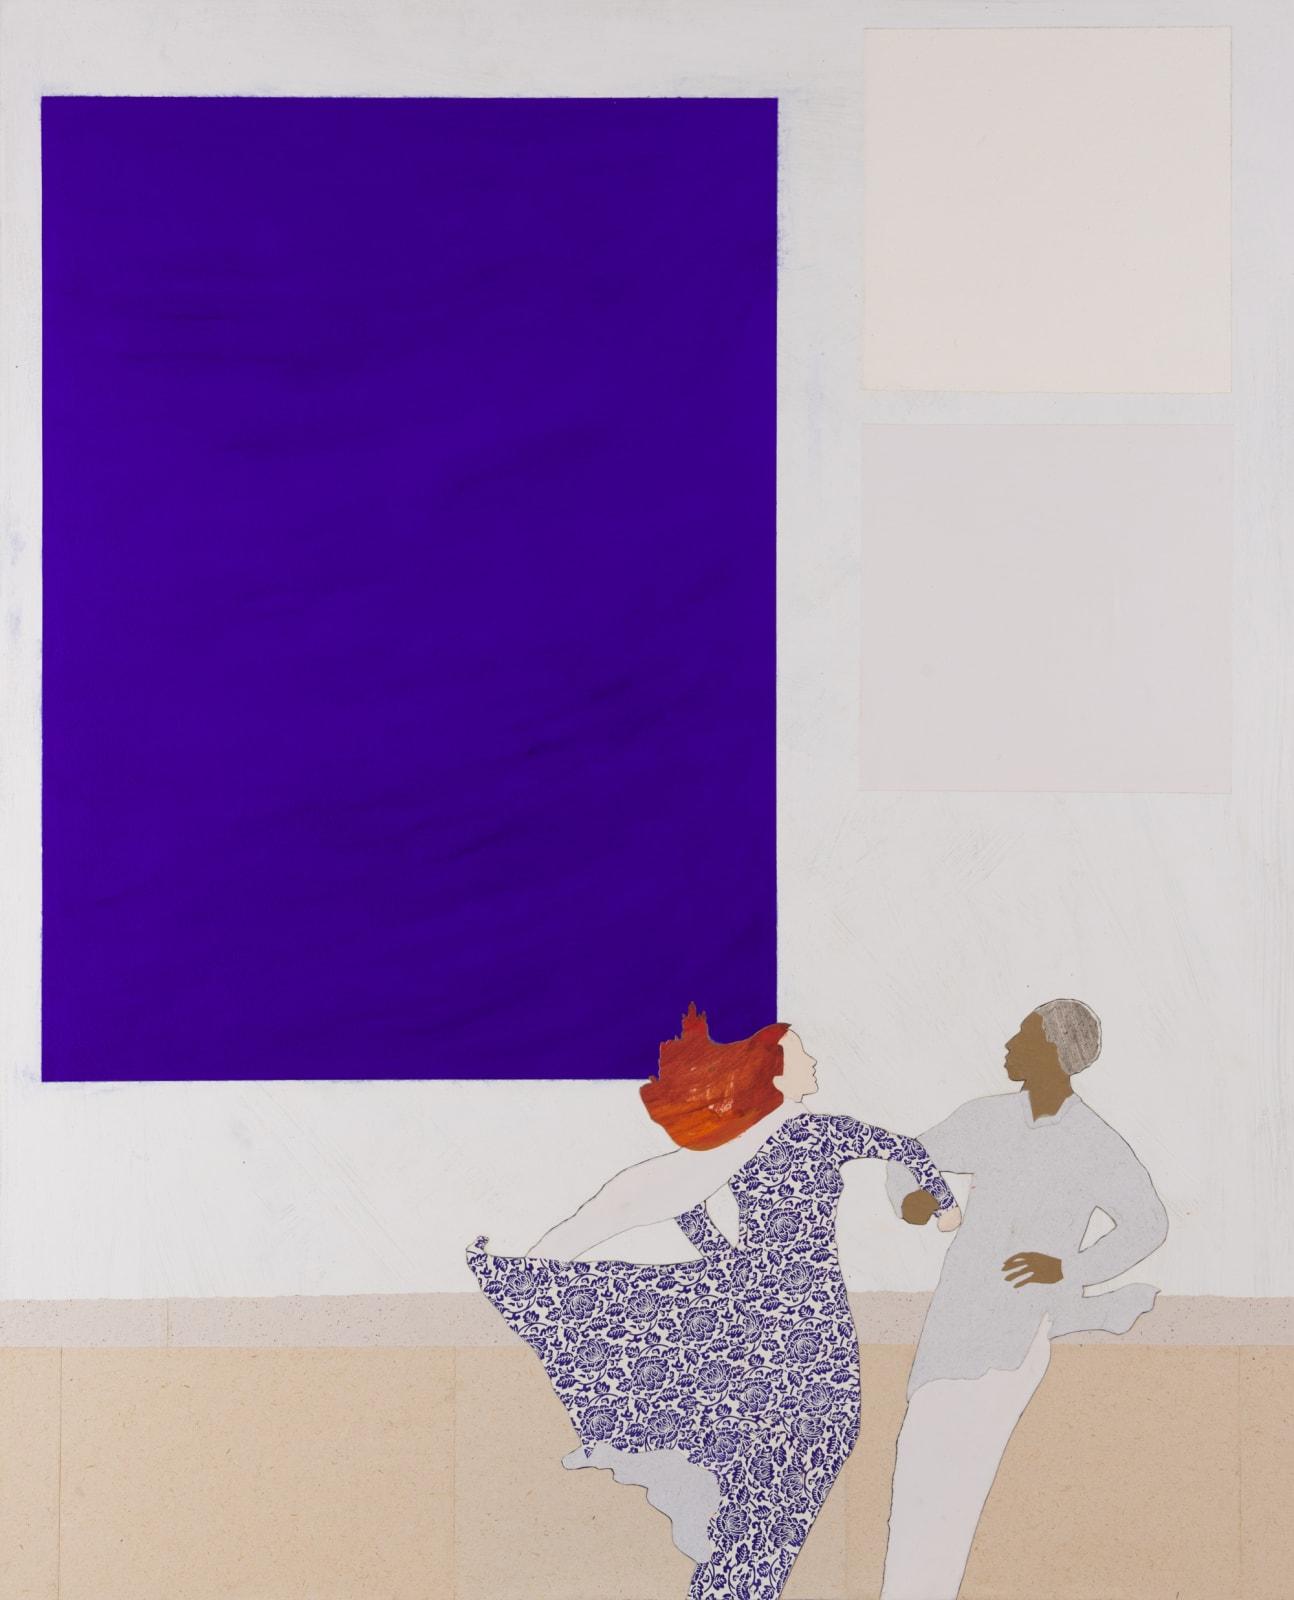 Dione Verulam, Klein inspires Dancing (London Gallery)